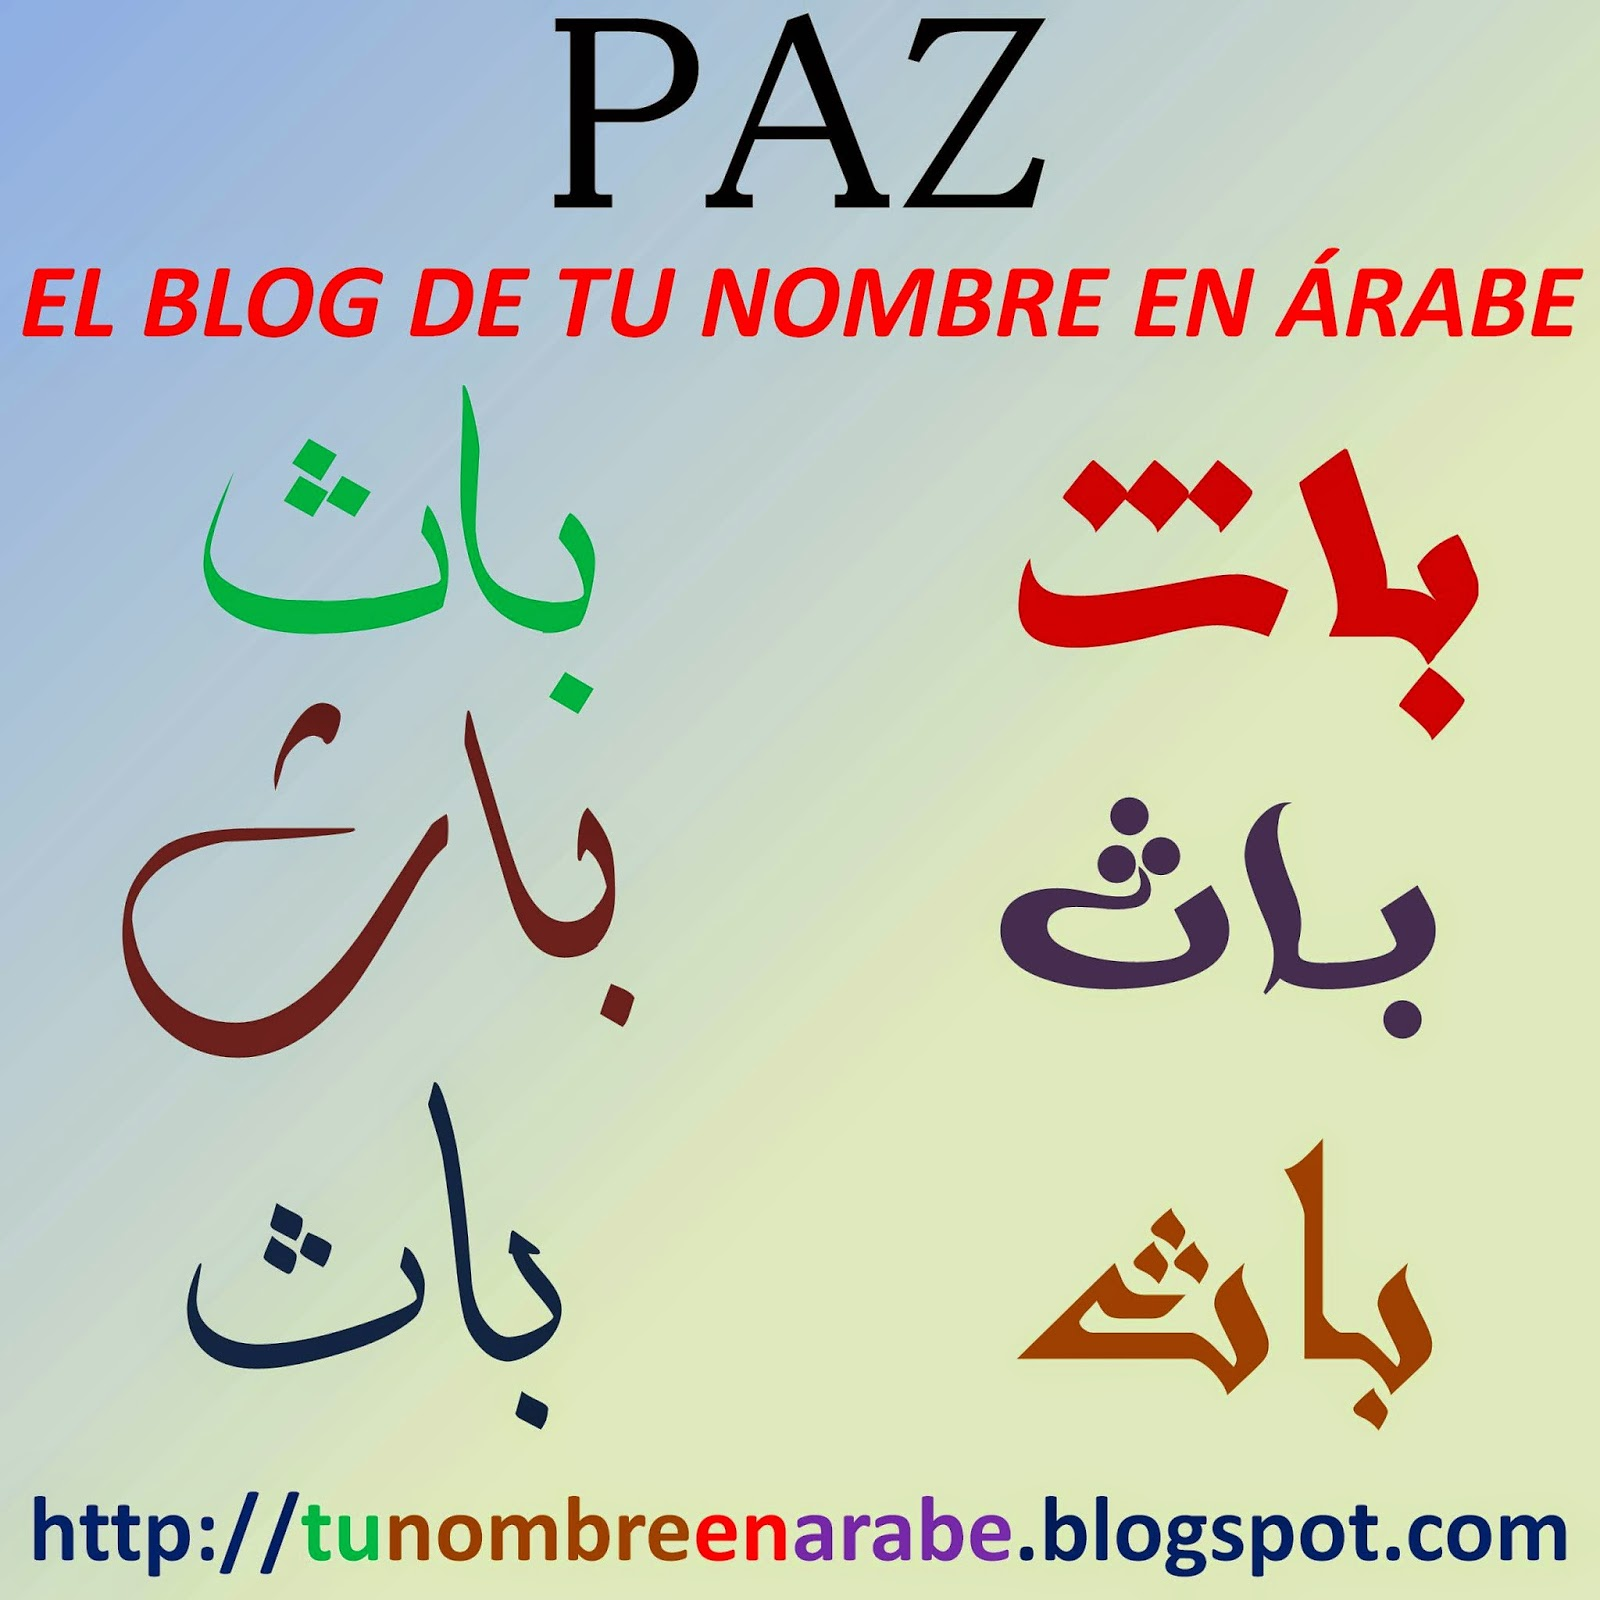 Escribir nombre Paz en letras arabes